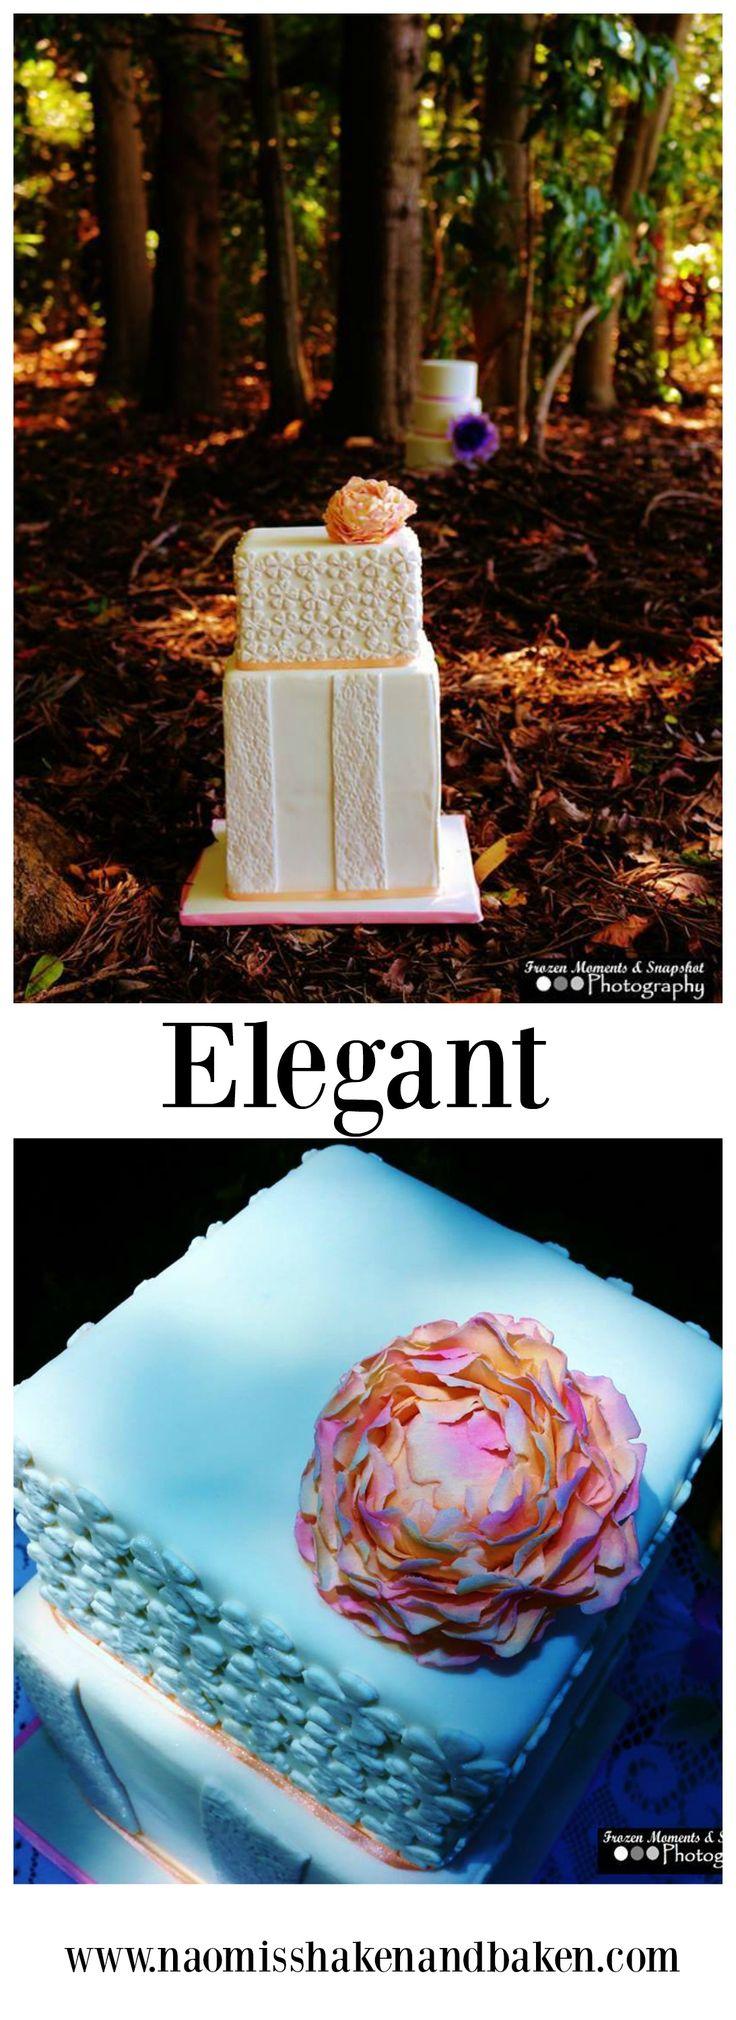 Wedding cake, wedding cupcakes, wedding, wedding planner, wedding event, gold coast, sunshine coast, Brisbane, hinterland weddings, romantic, rustic, vintage, simple, elegant, stunning, beautiful, love, breath taking, lovely, gorgeous, luxury, quality, cake, divine, mud cakes, vegan cakes, gluten free cakes, tantalizing, flowers. Edible art, edible toppers, edible flowers, Bride, groom, Caboolture, cake decorator, professional , square wedding cake, lace, peony